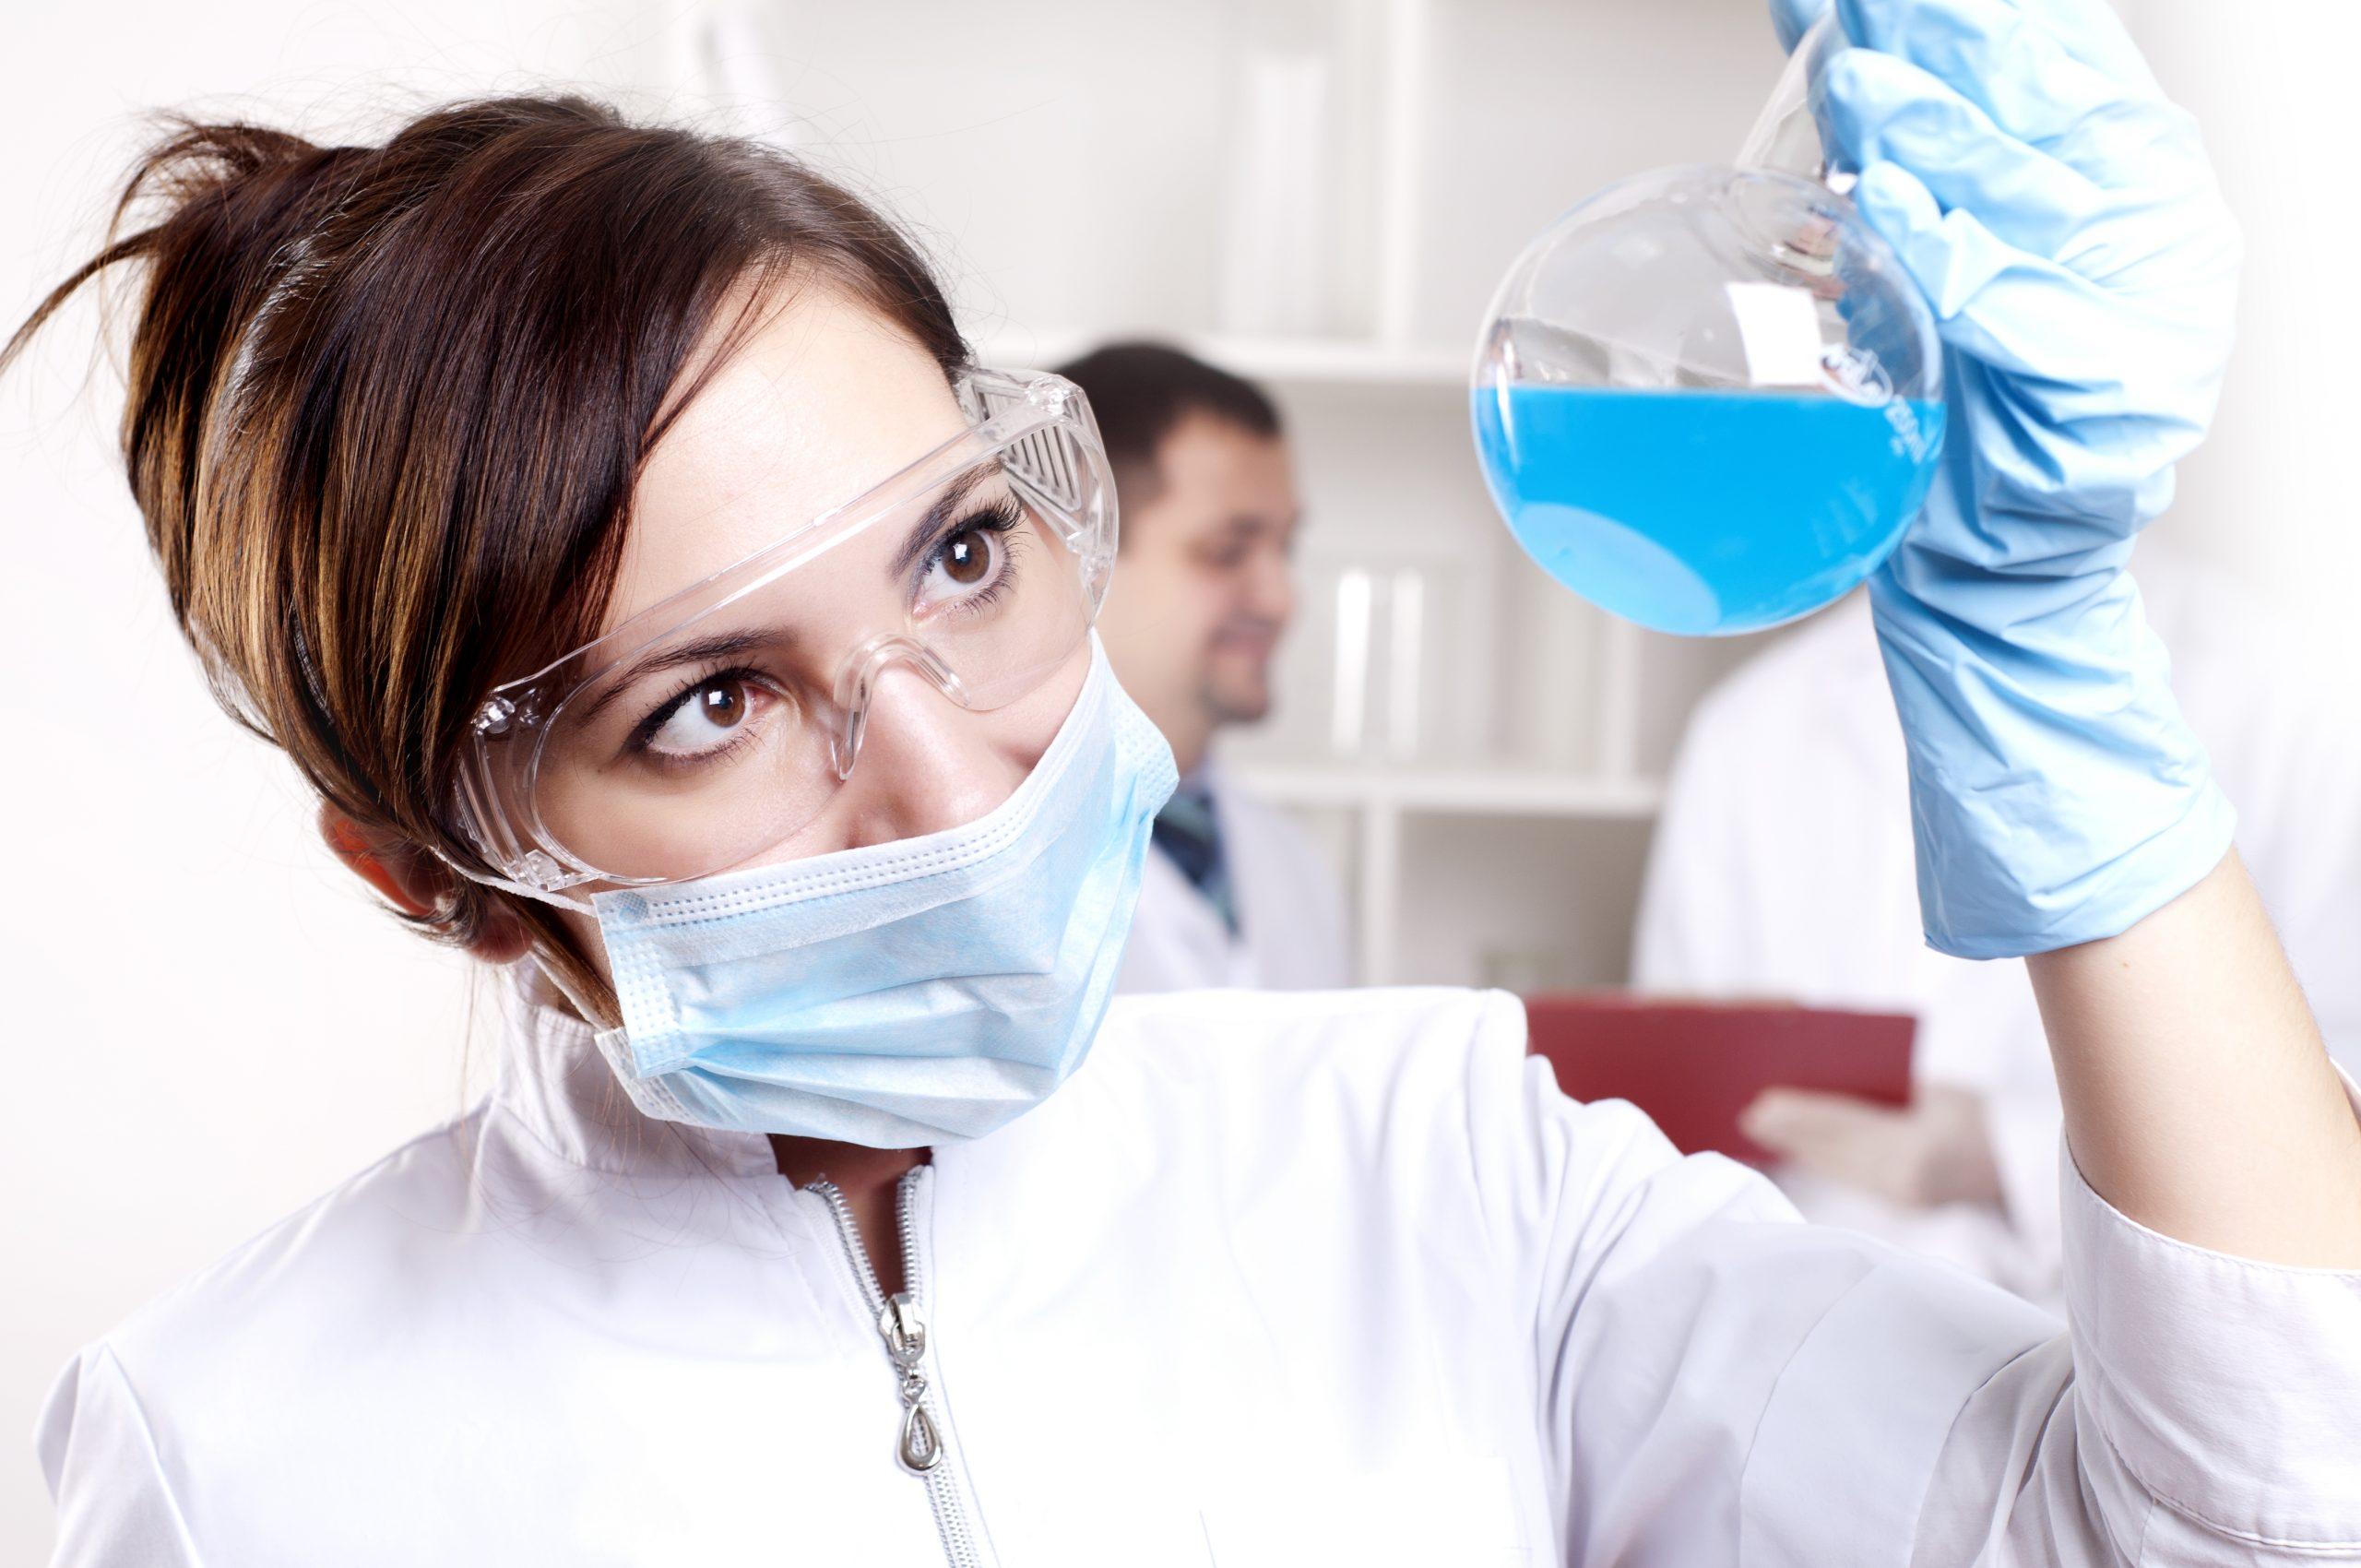 Pharma Quality Control & Quality Assurance